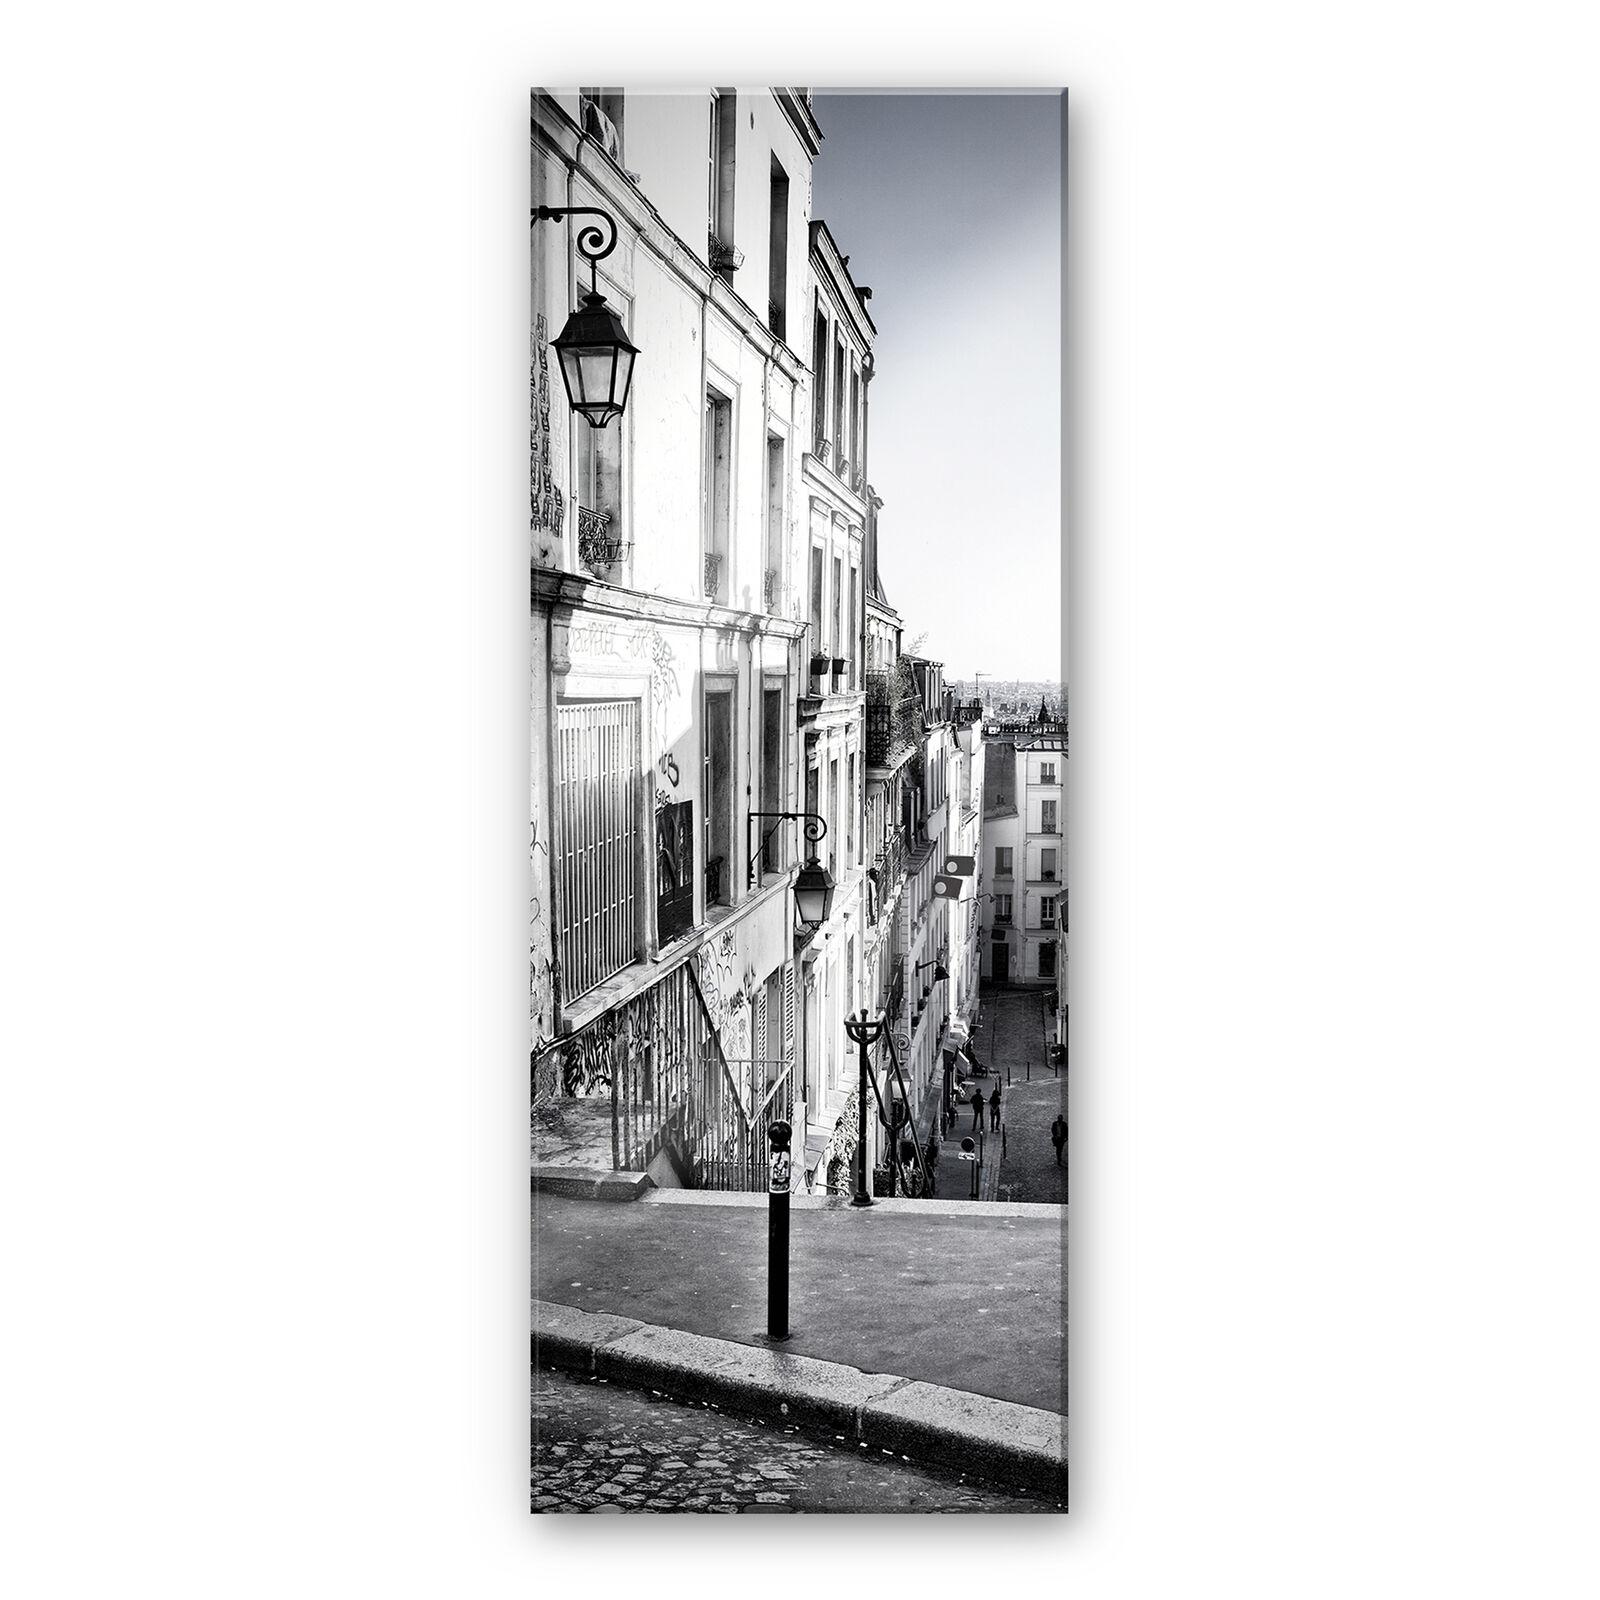 Acrylglas XXL Wandbild Montmartre - Panorama schwarz weiß BILD hohe Farbechtheit